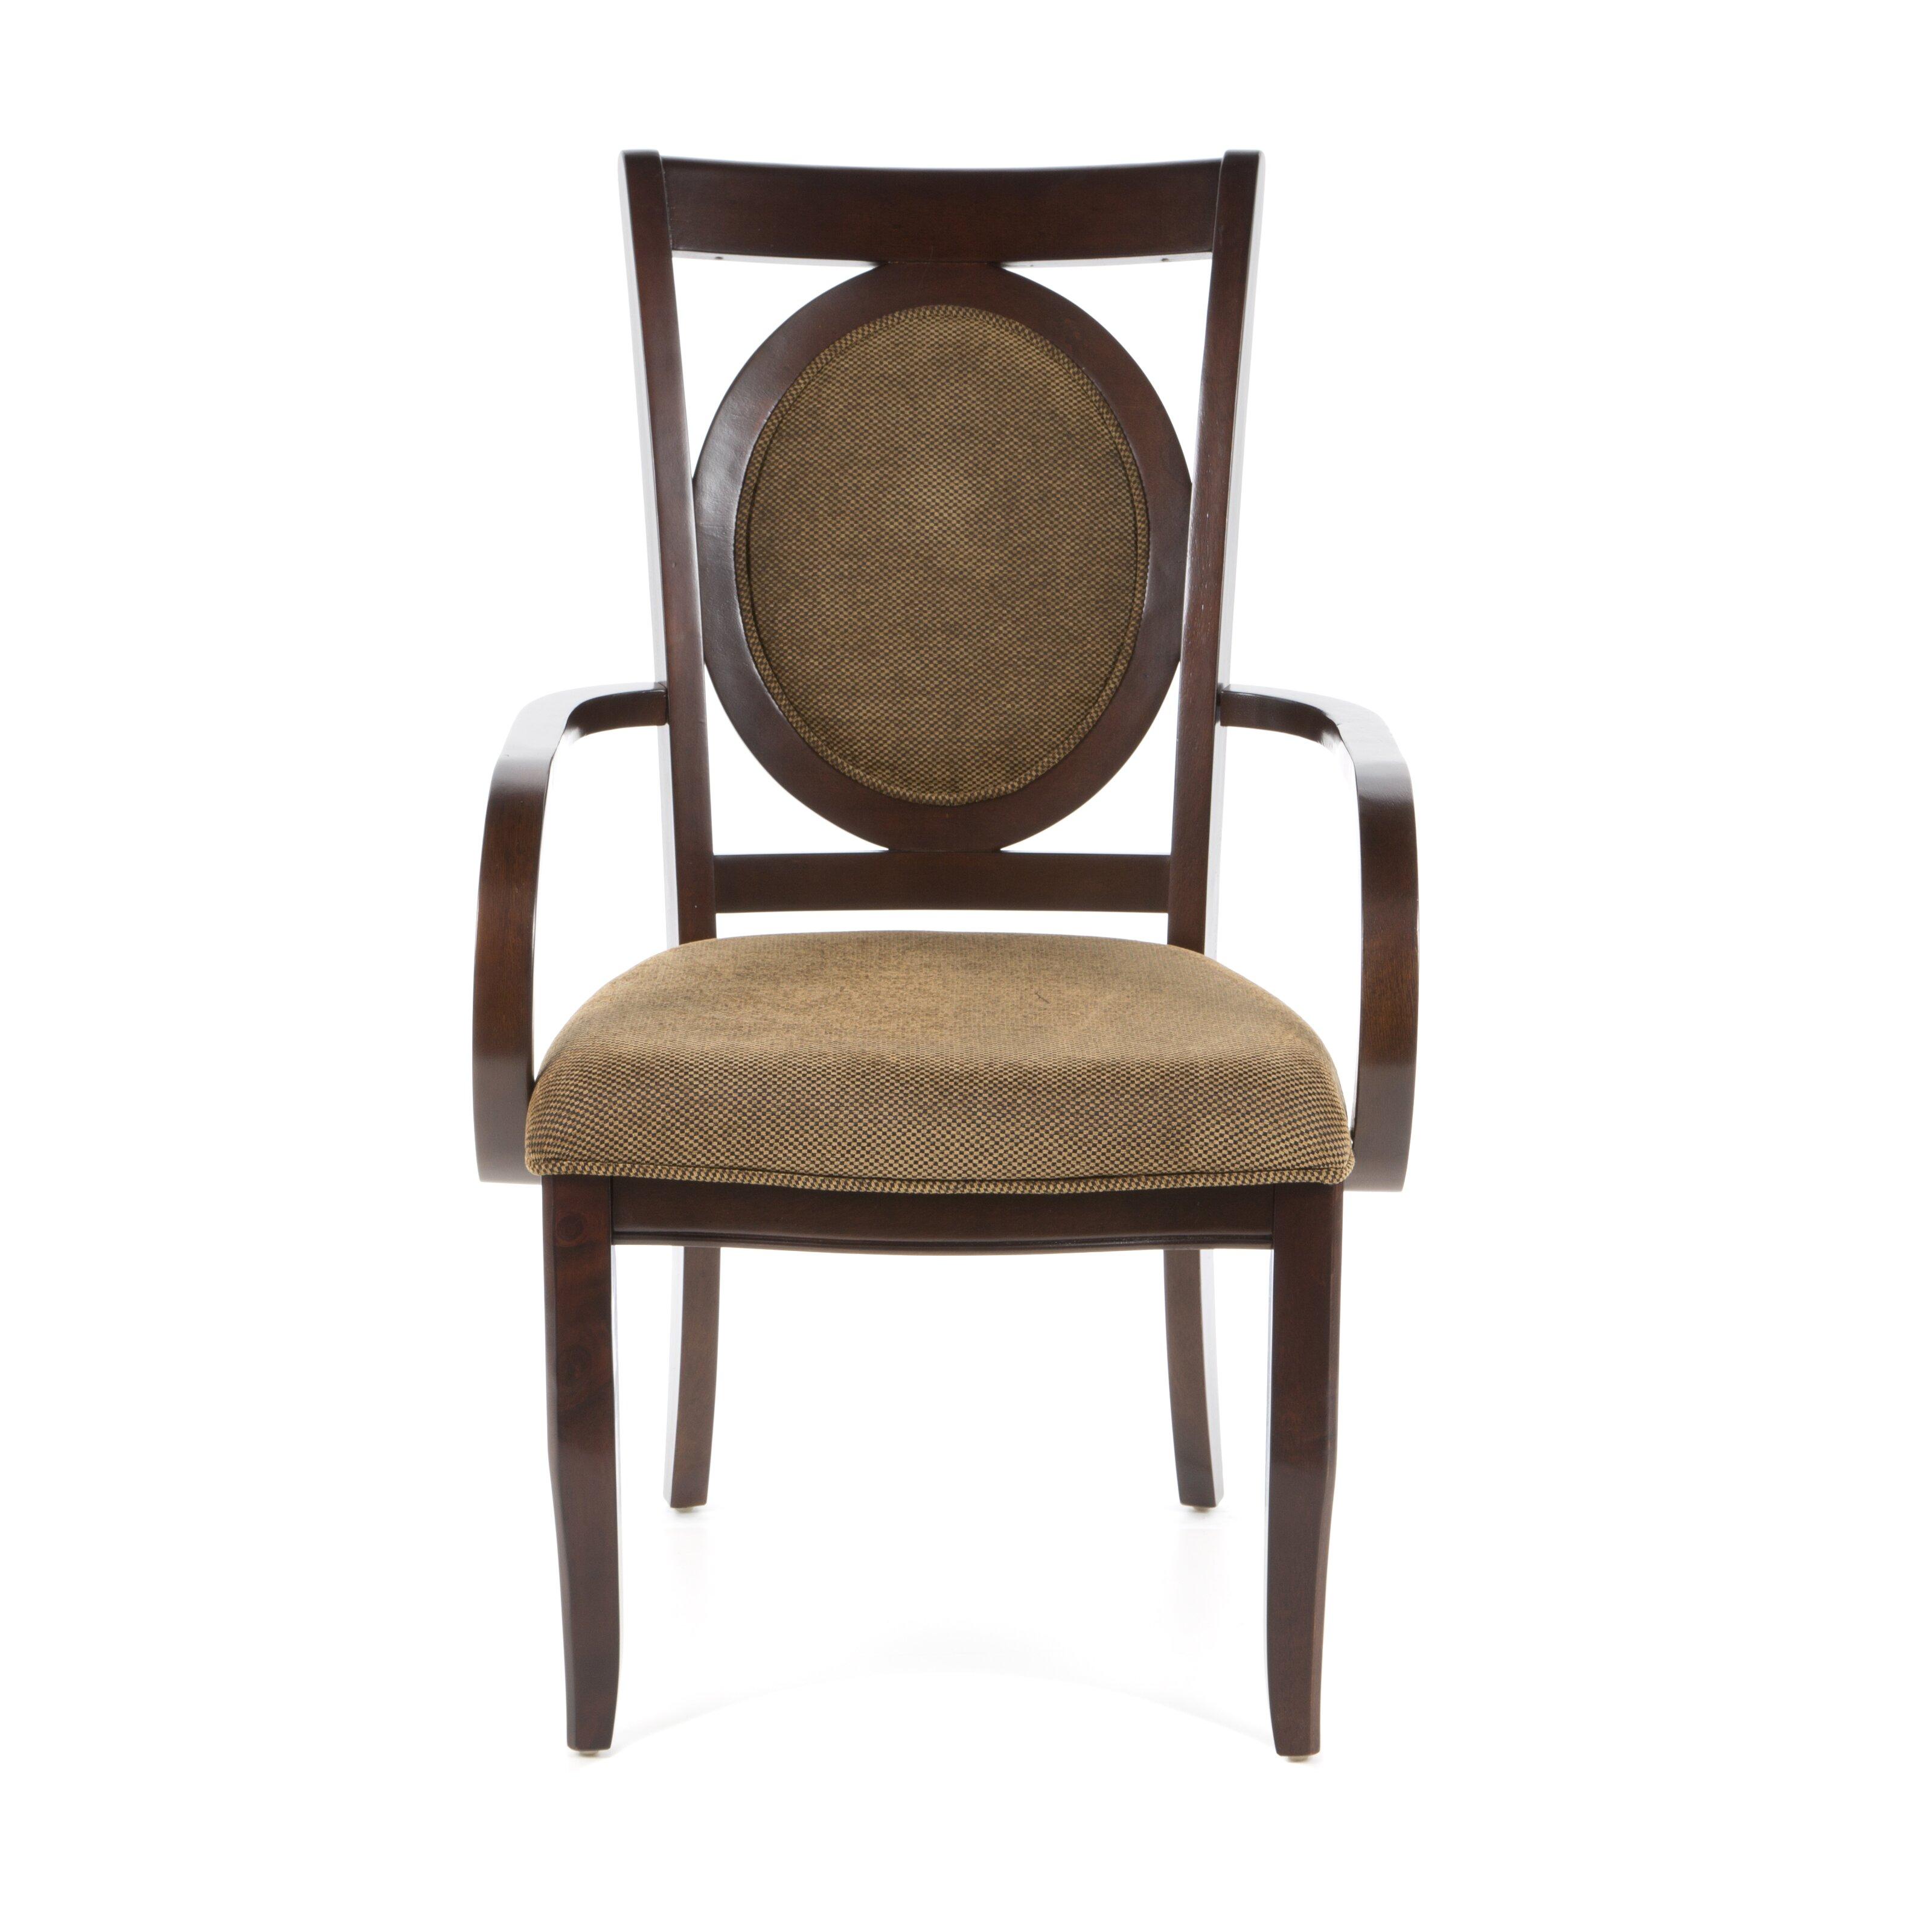 Steve Silver Furniture Montblanc Arm Chair Reviews Wayfair